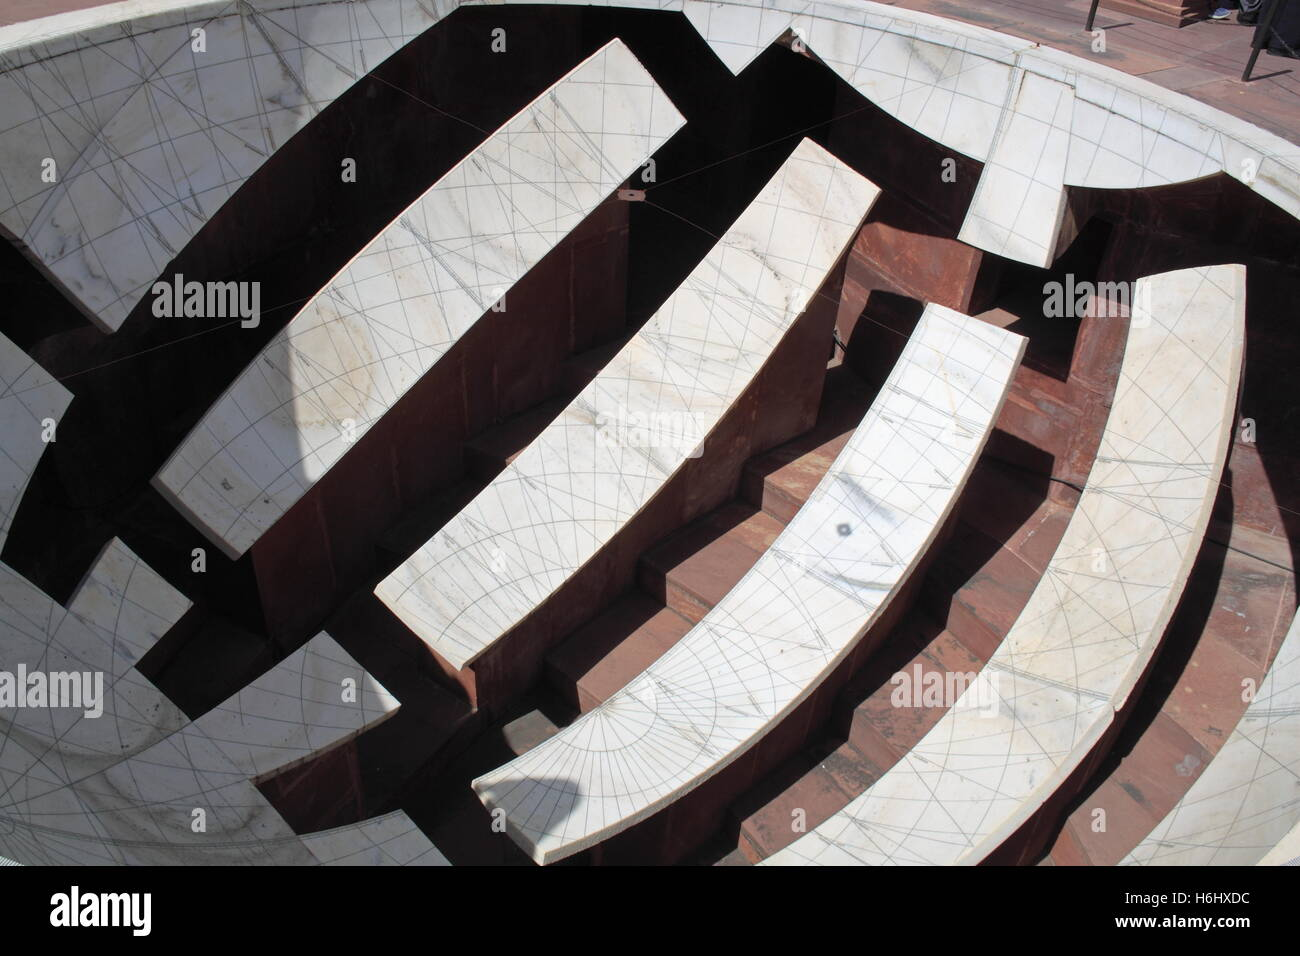 Jai Prakash Yantra, Jantar Mantar astronomical observatory, Jaipur, Rajasthan, India, Indian subcontinent, South - Stock Image